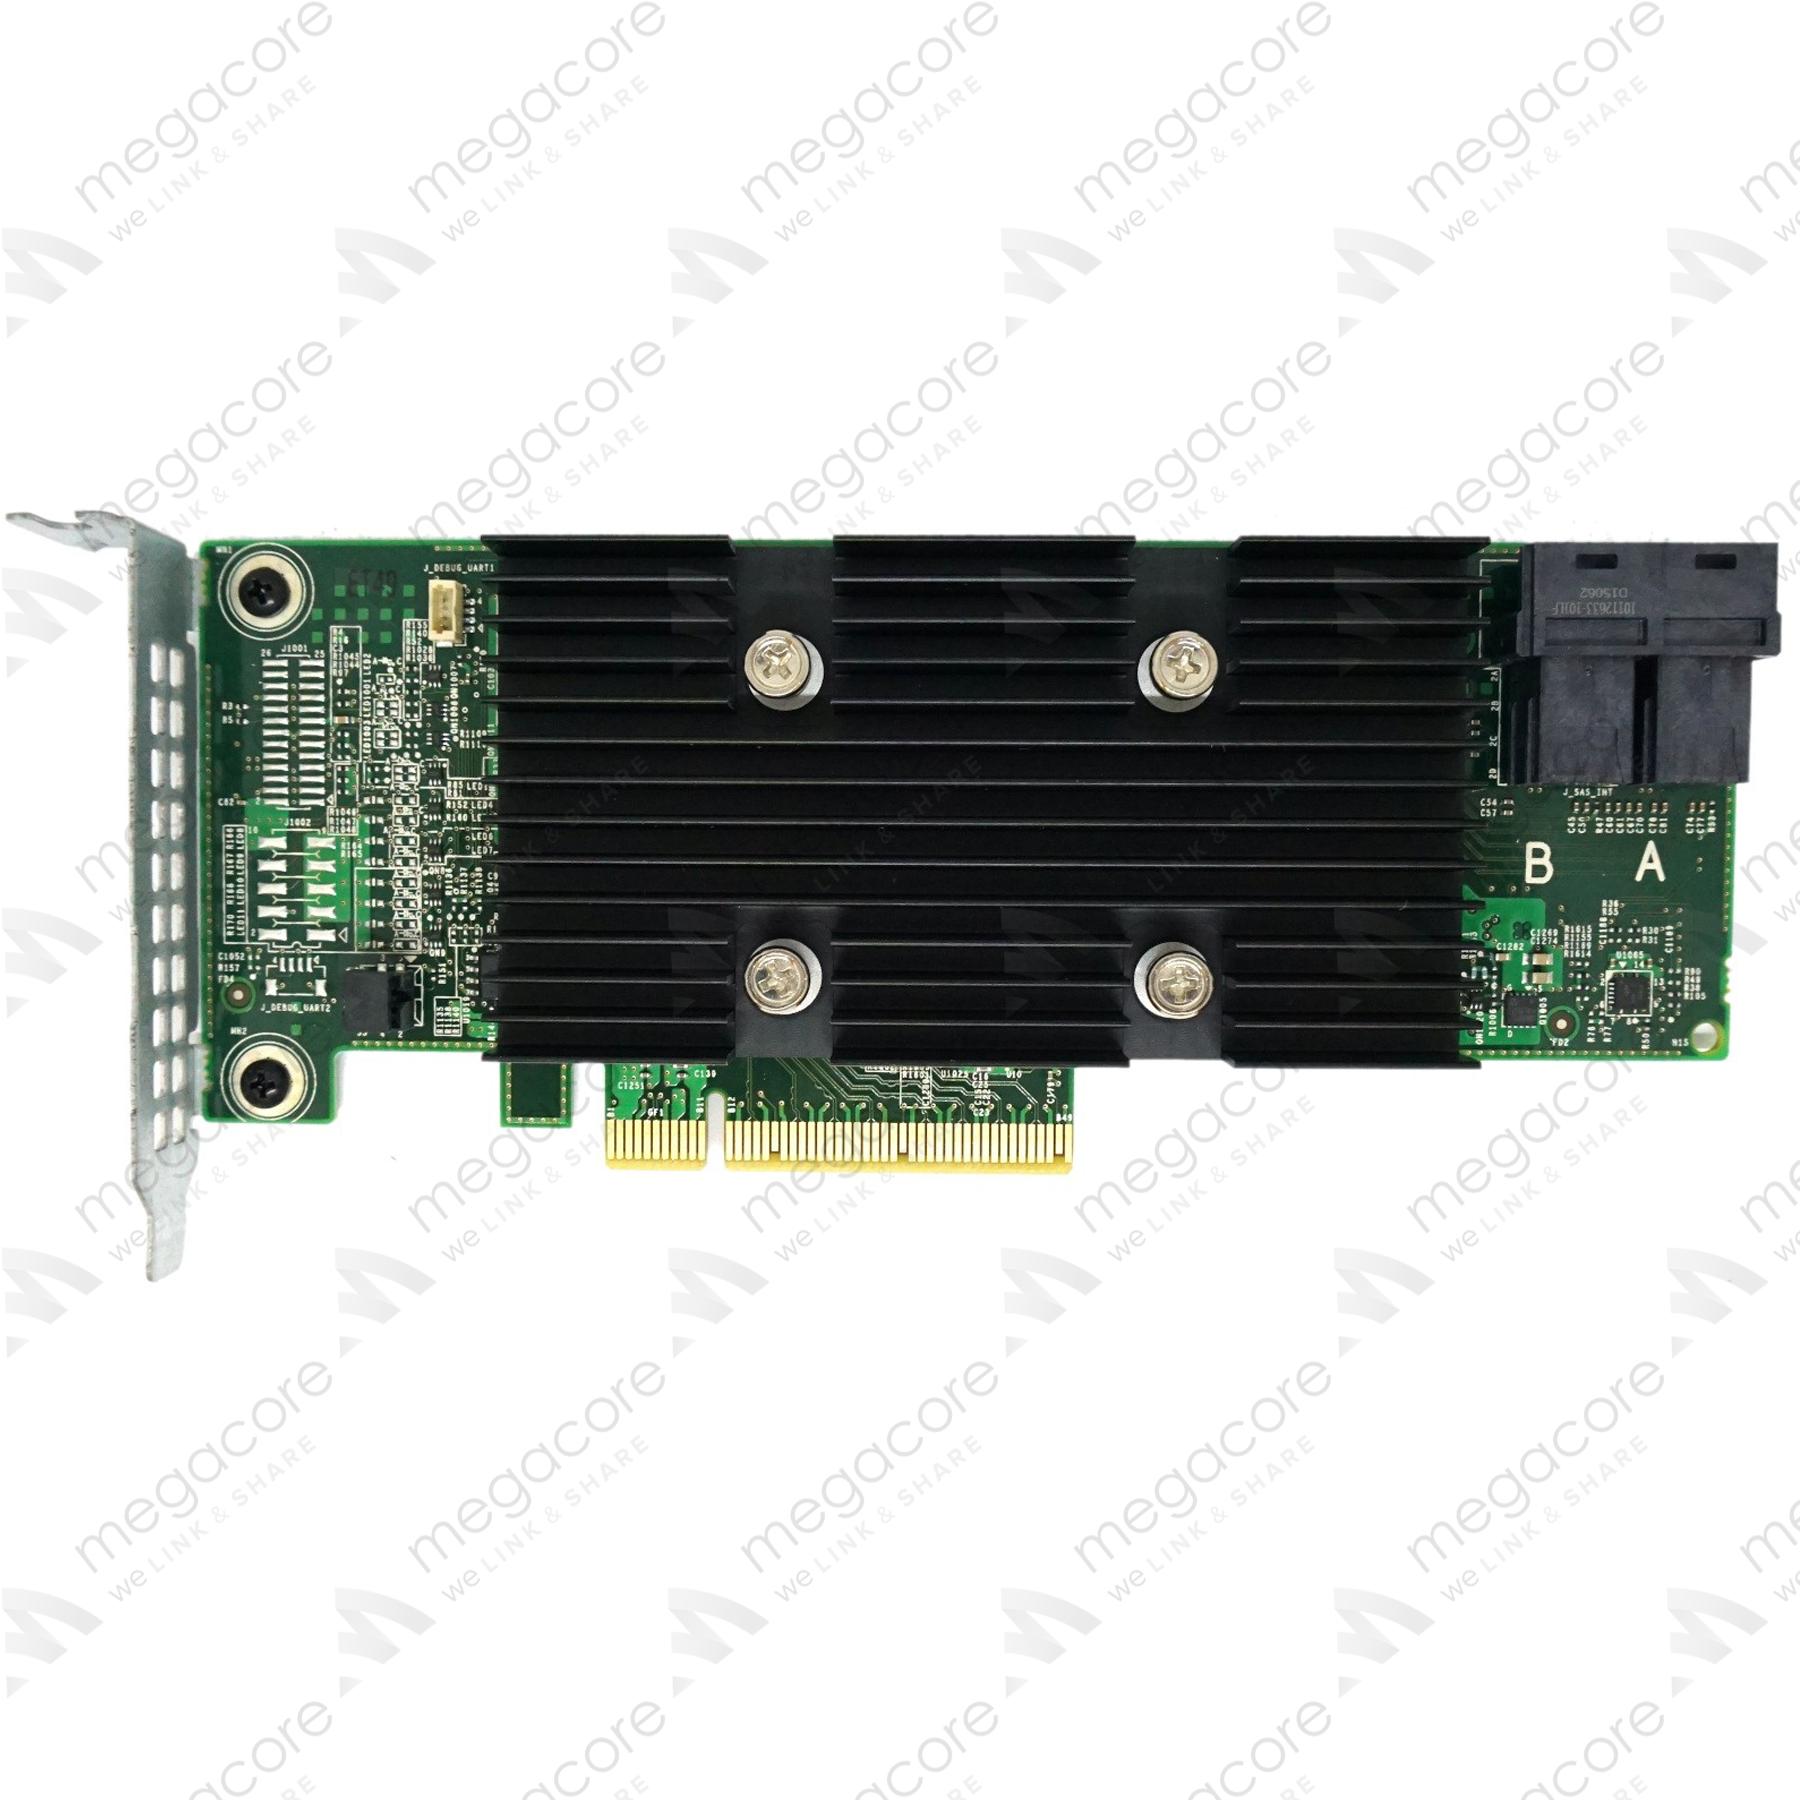 H330 11 - Flash/Crossflash Card Raid DELL H330 Sang HBA330/12Gbps HBA IT Firmware